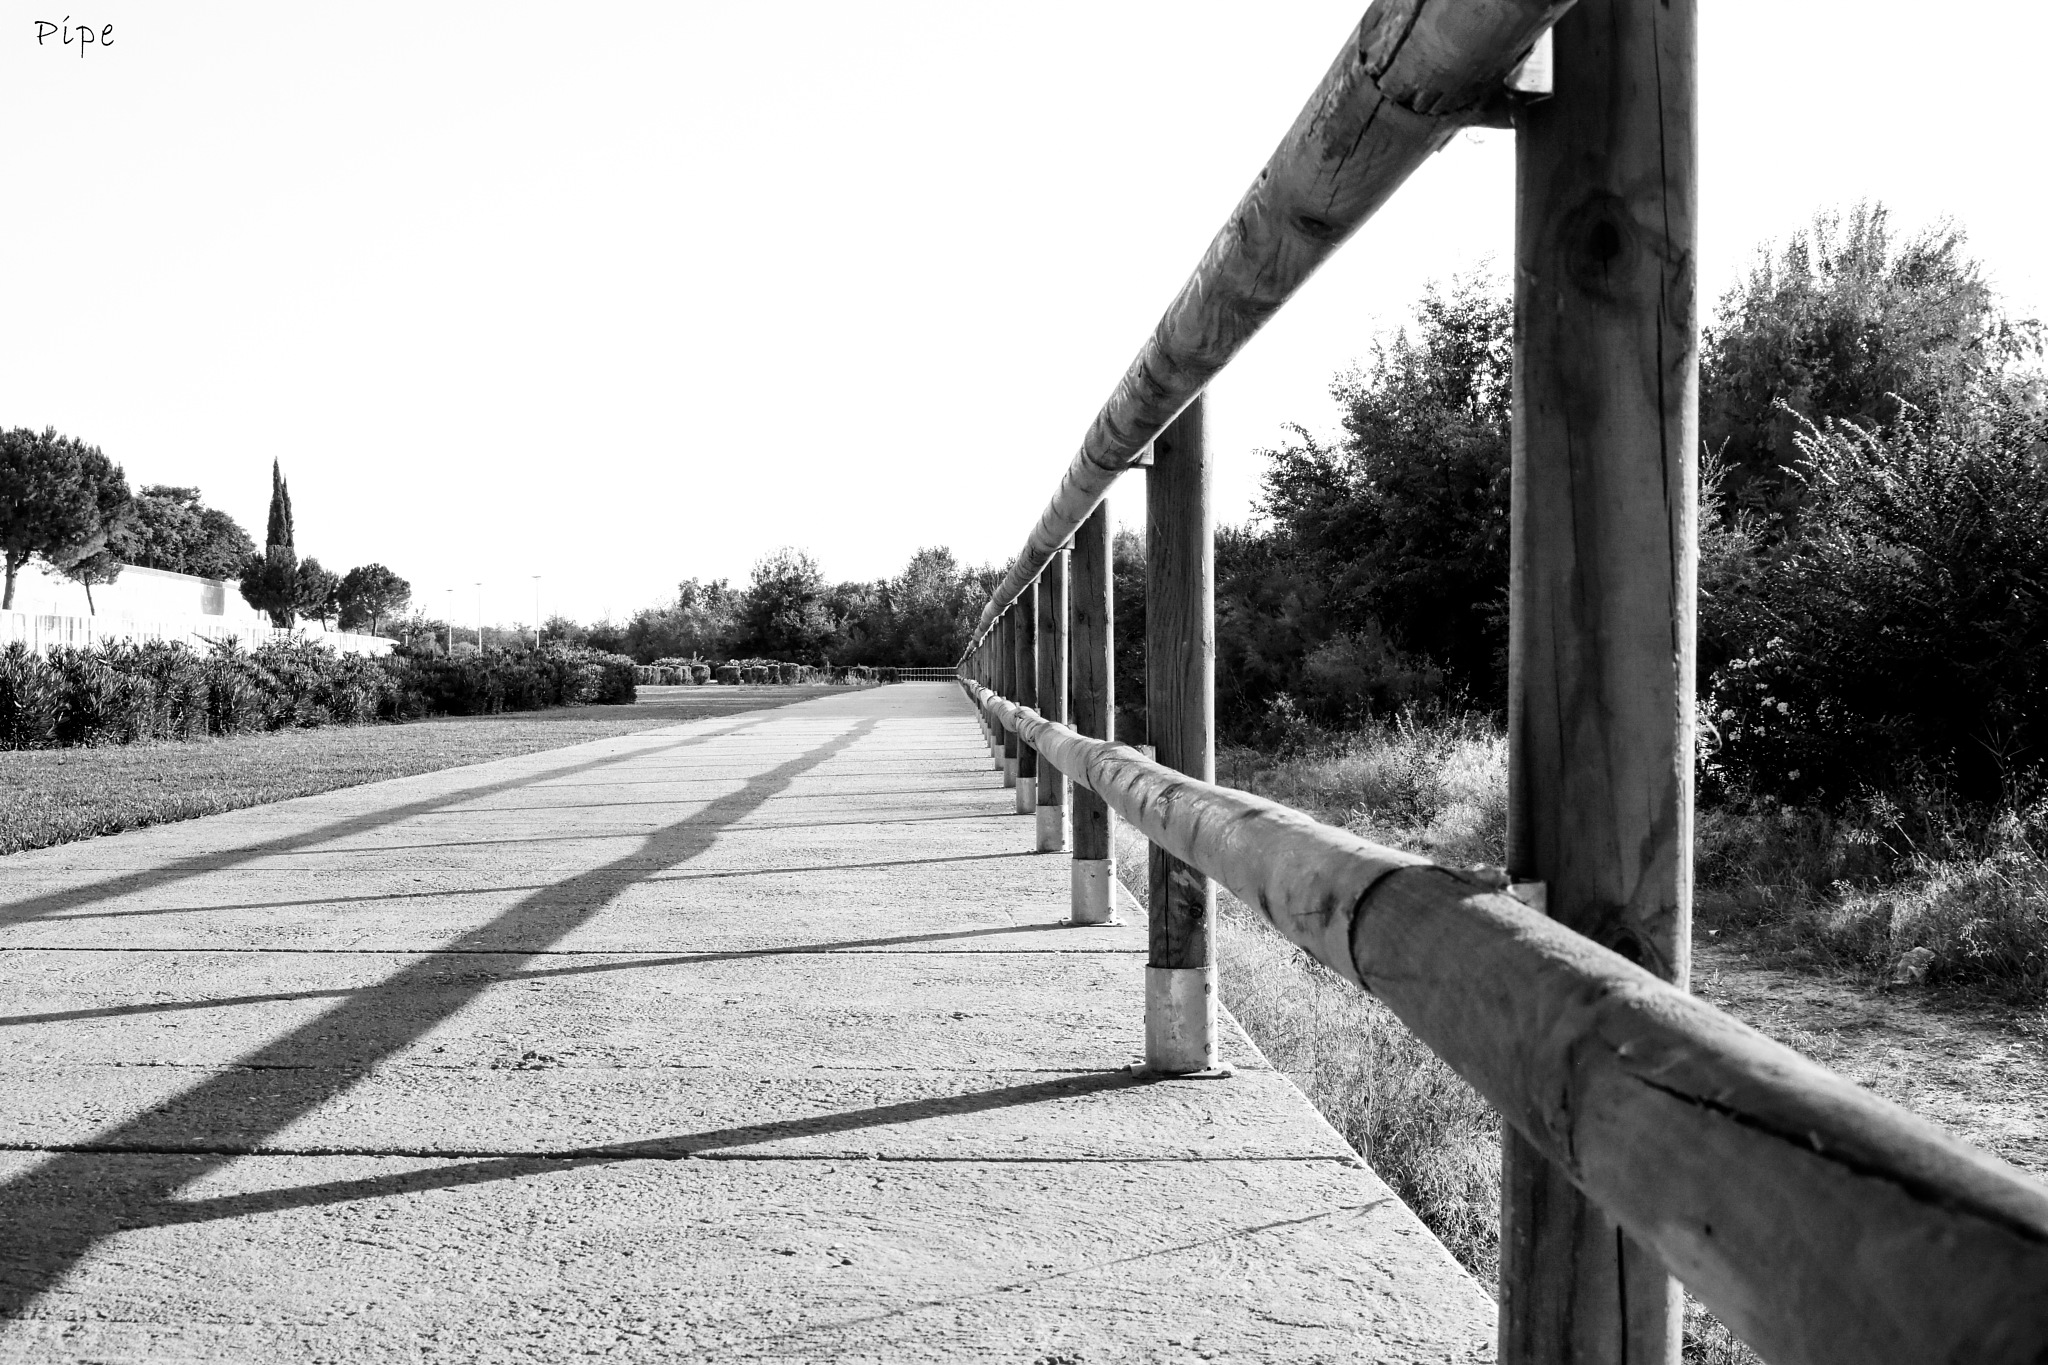 Follow the lines... by Luis Felipe Muñoz Vaquerizo